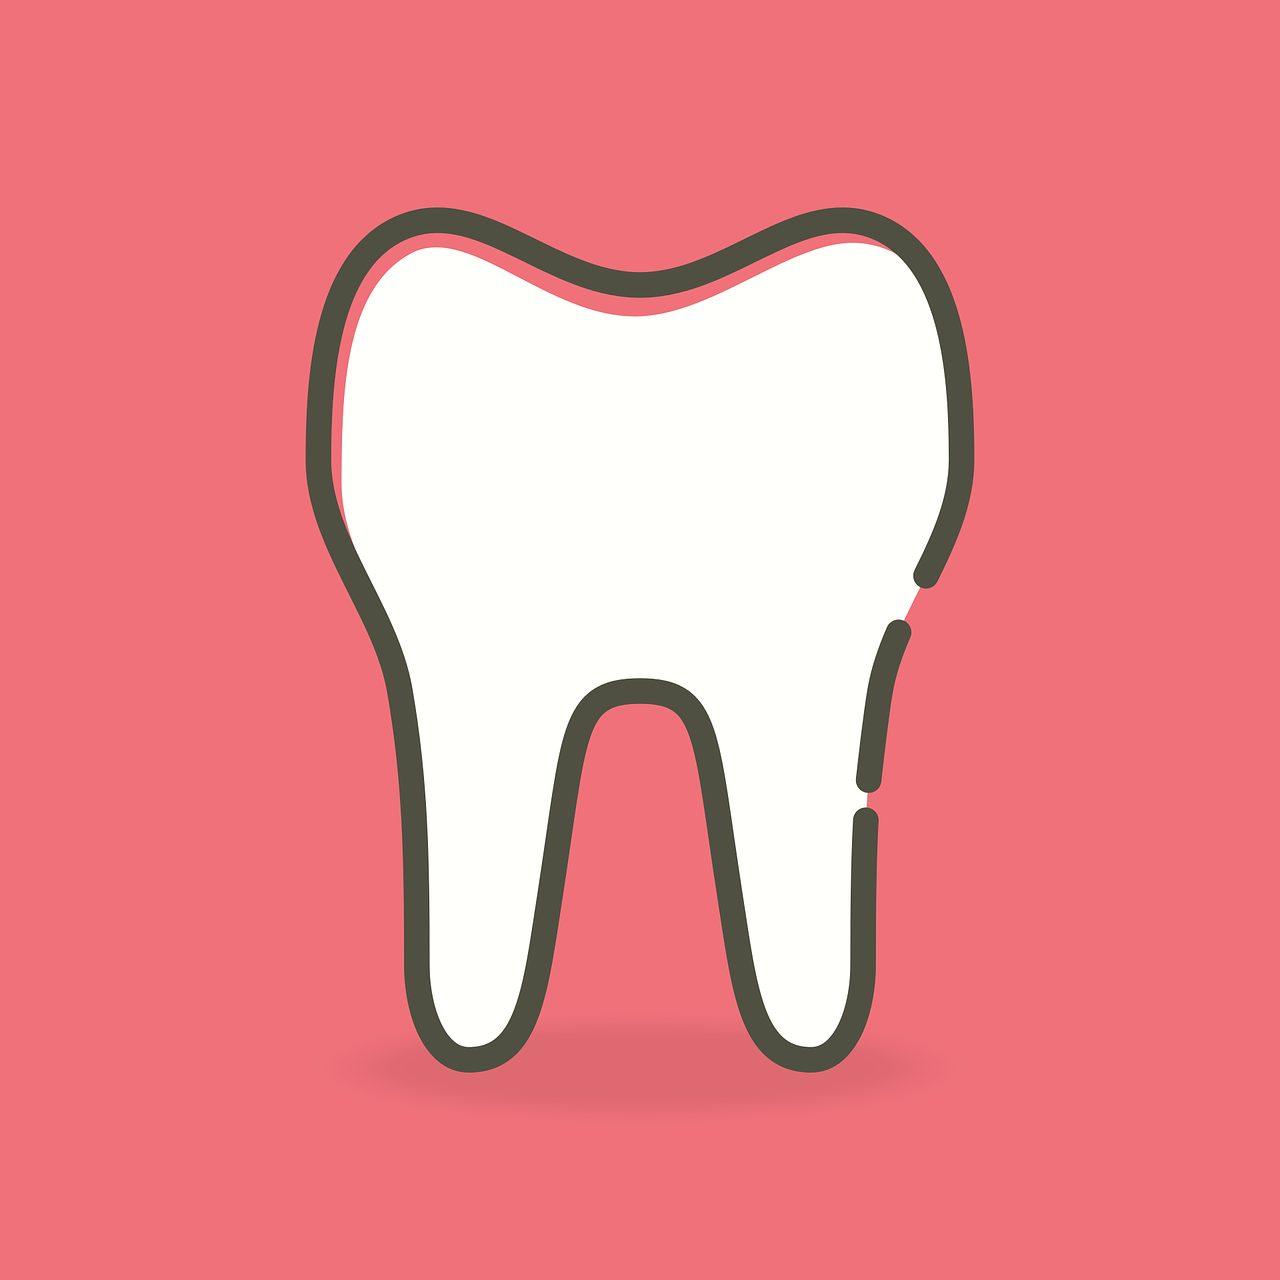 Hartog Tandarts K tandarts spoed